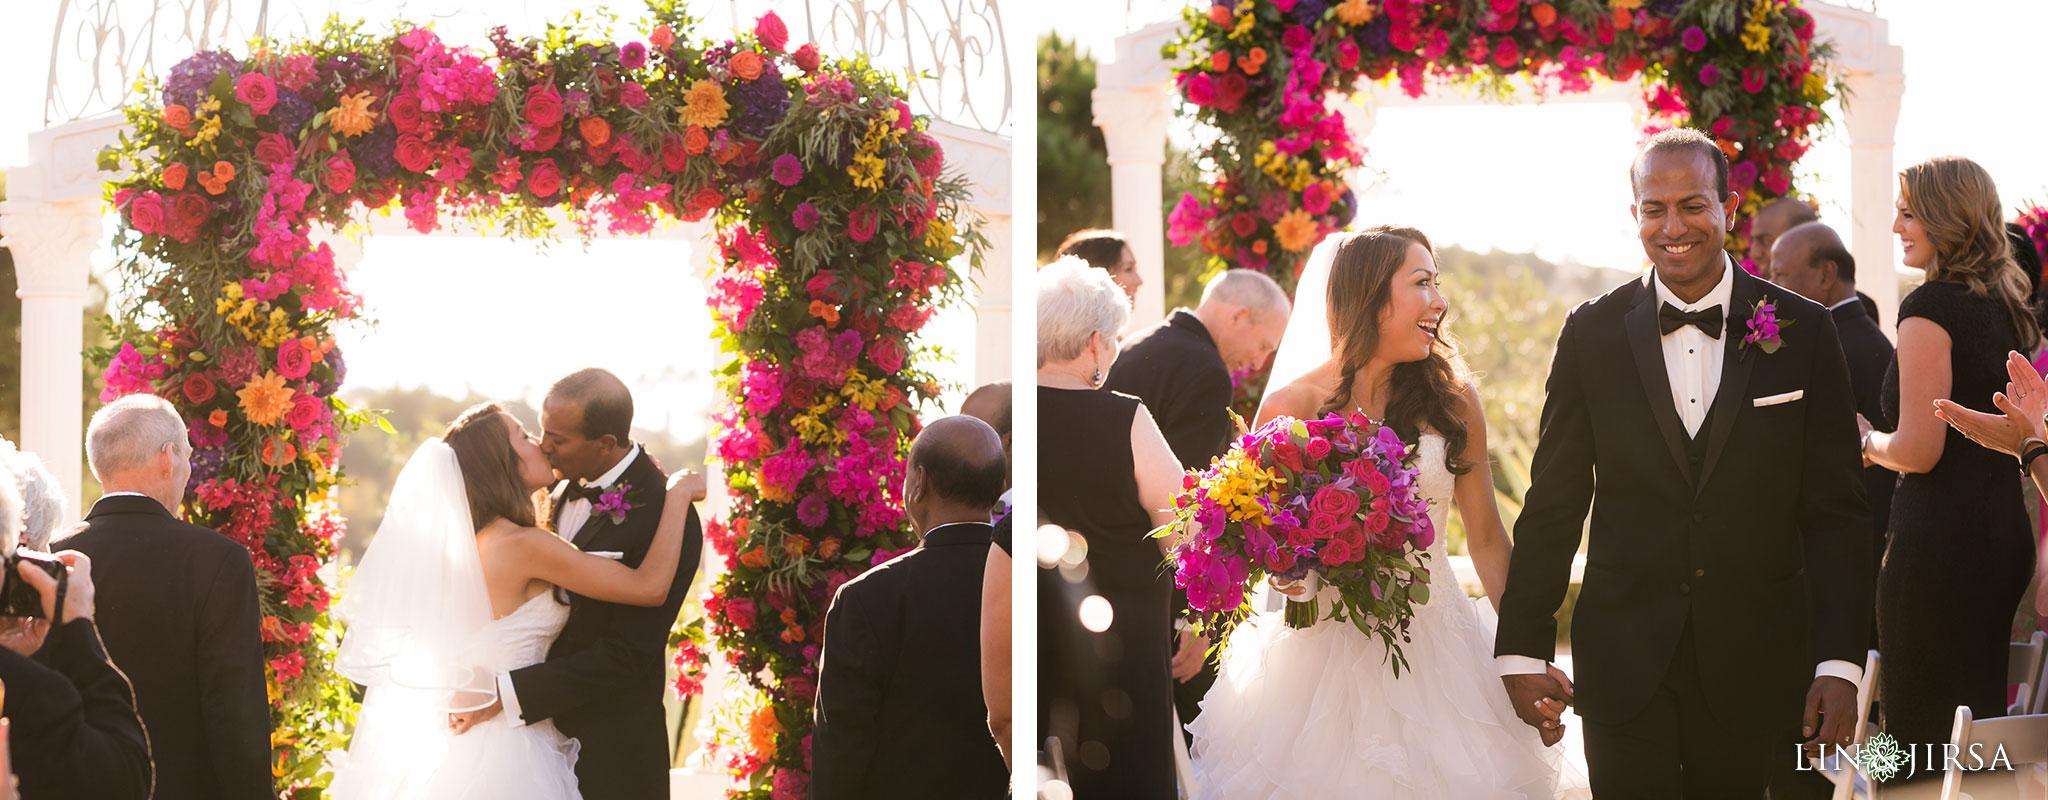 22 monarch beach resort wedding ceremony photography